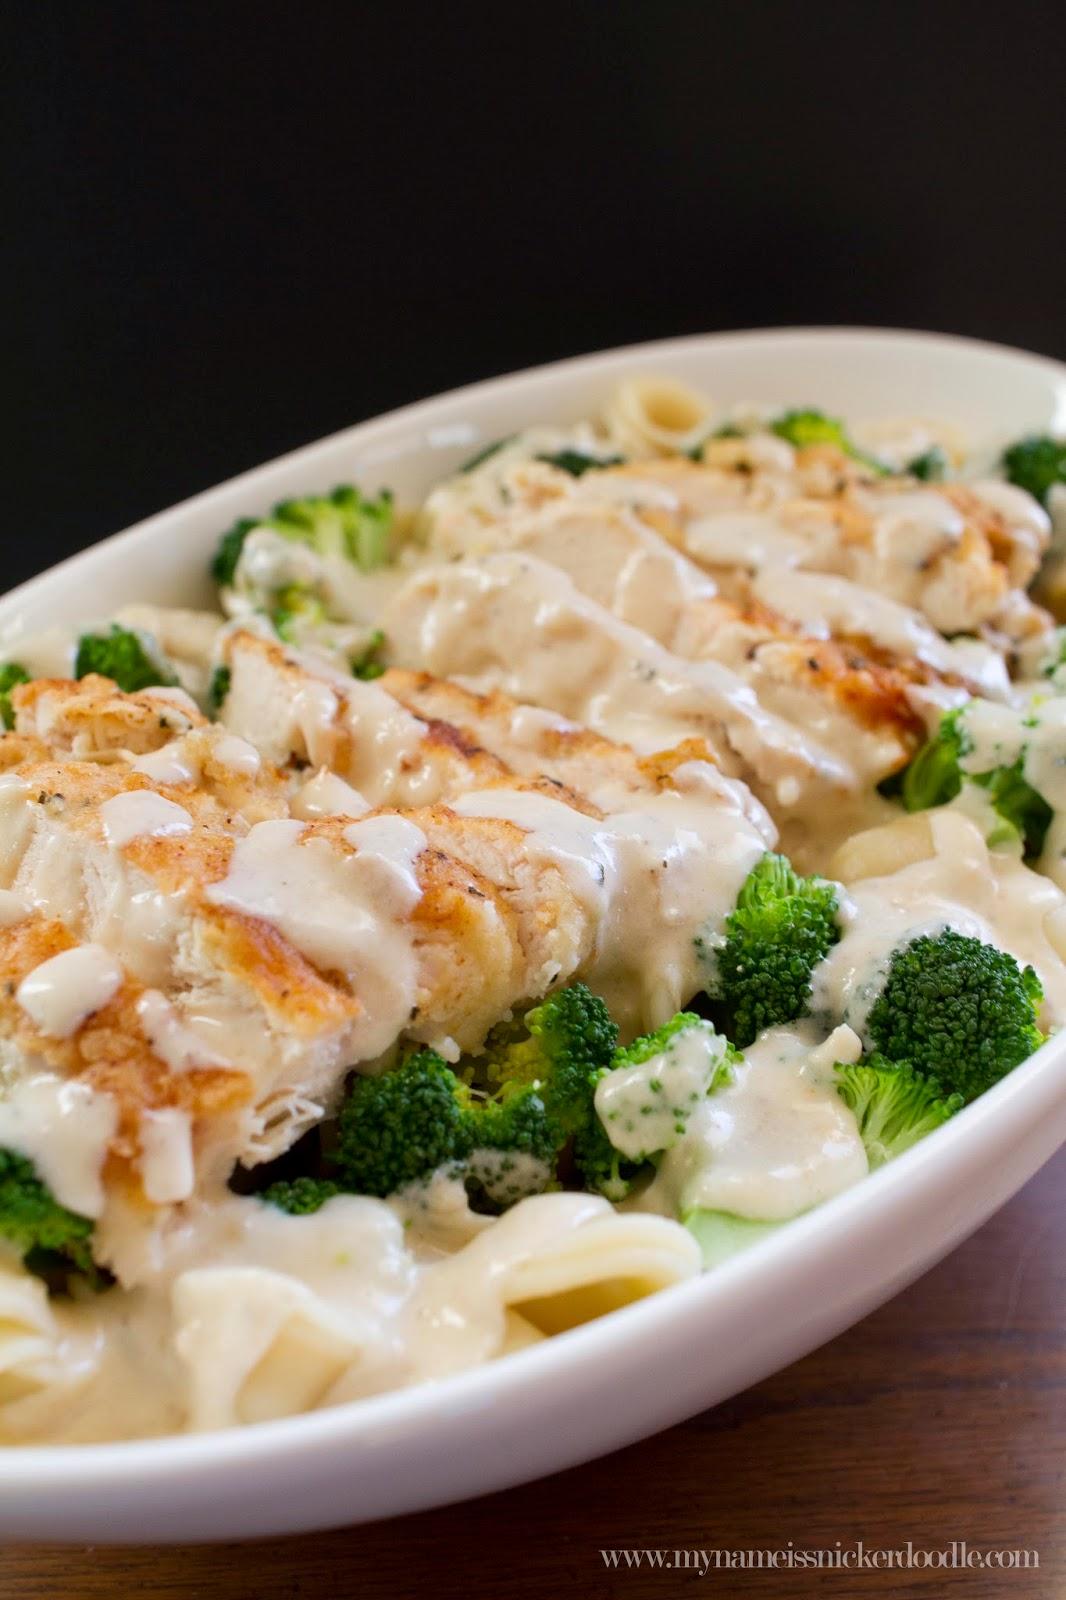 This Creamy Garlic Chicken and Broccoli Pasta recipe rivals the Chicken Con Broccoli dish at Olive Garden!  |  mynameissnickerdoodle.com